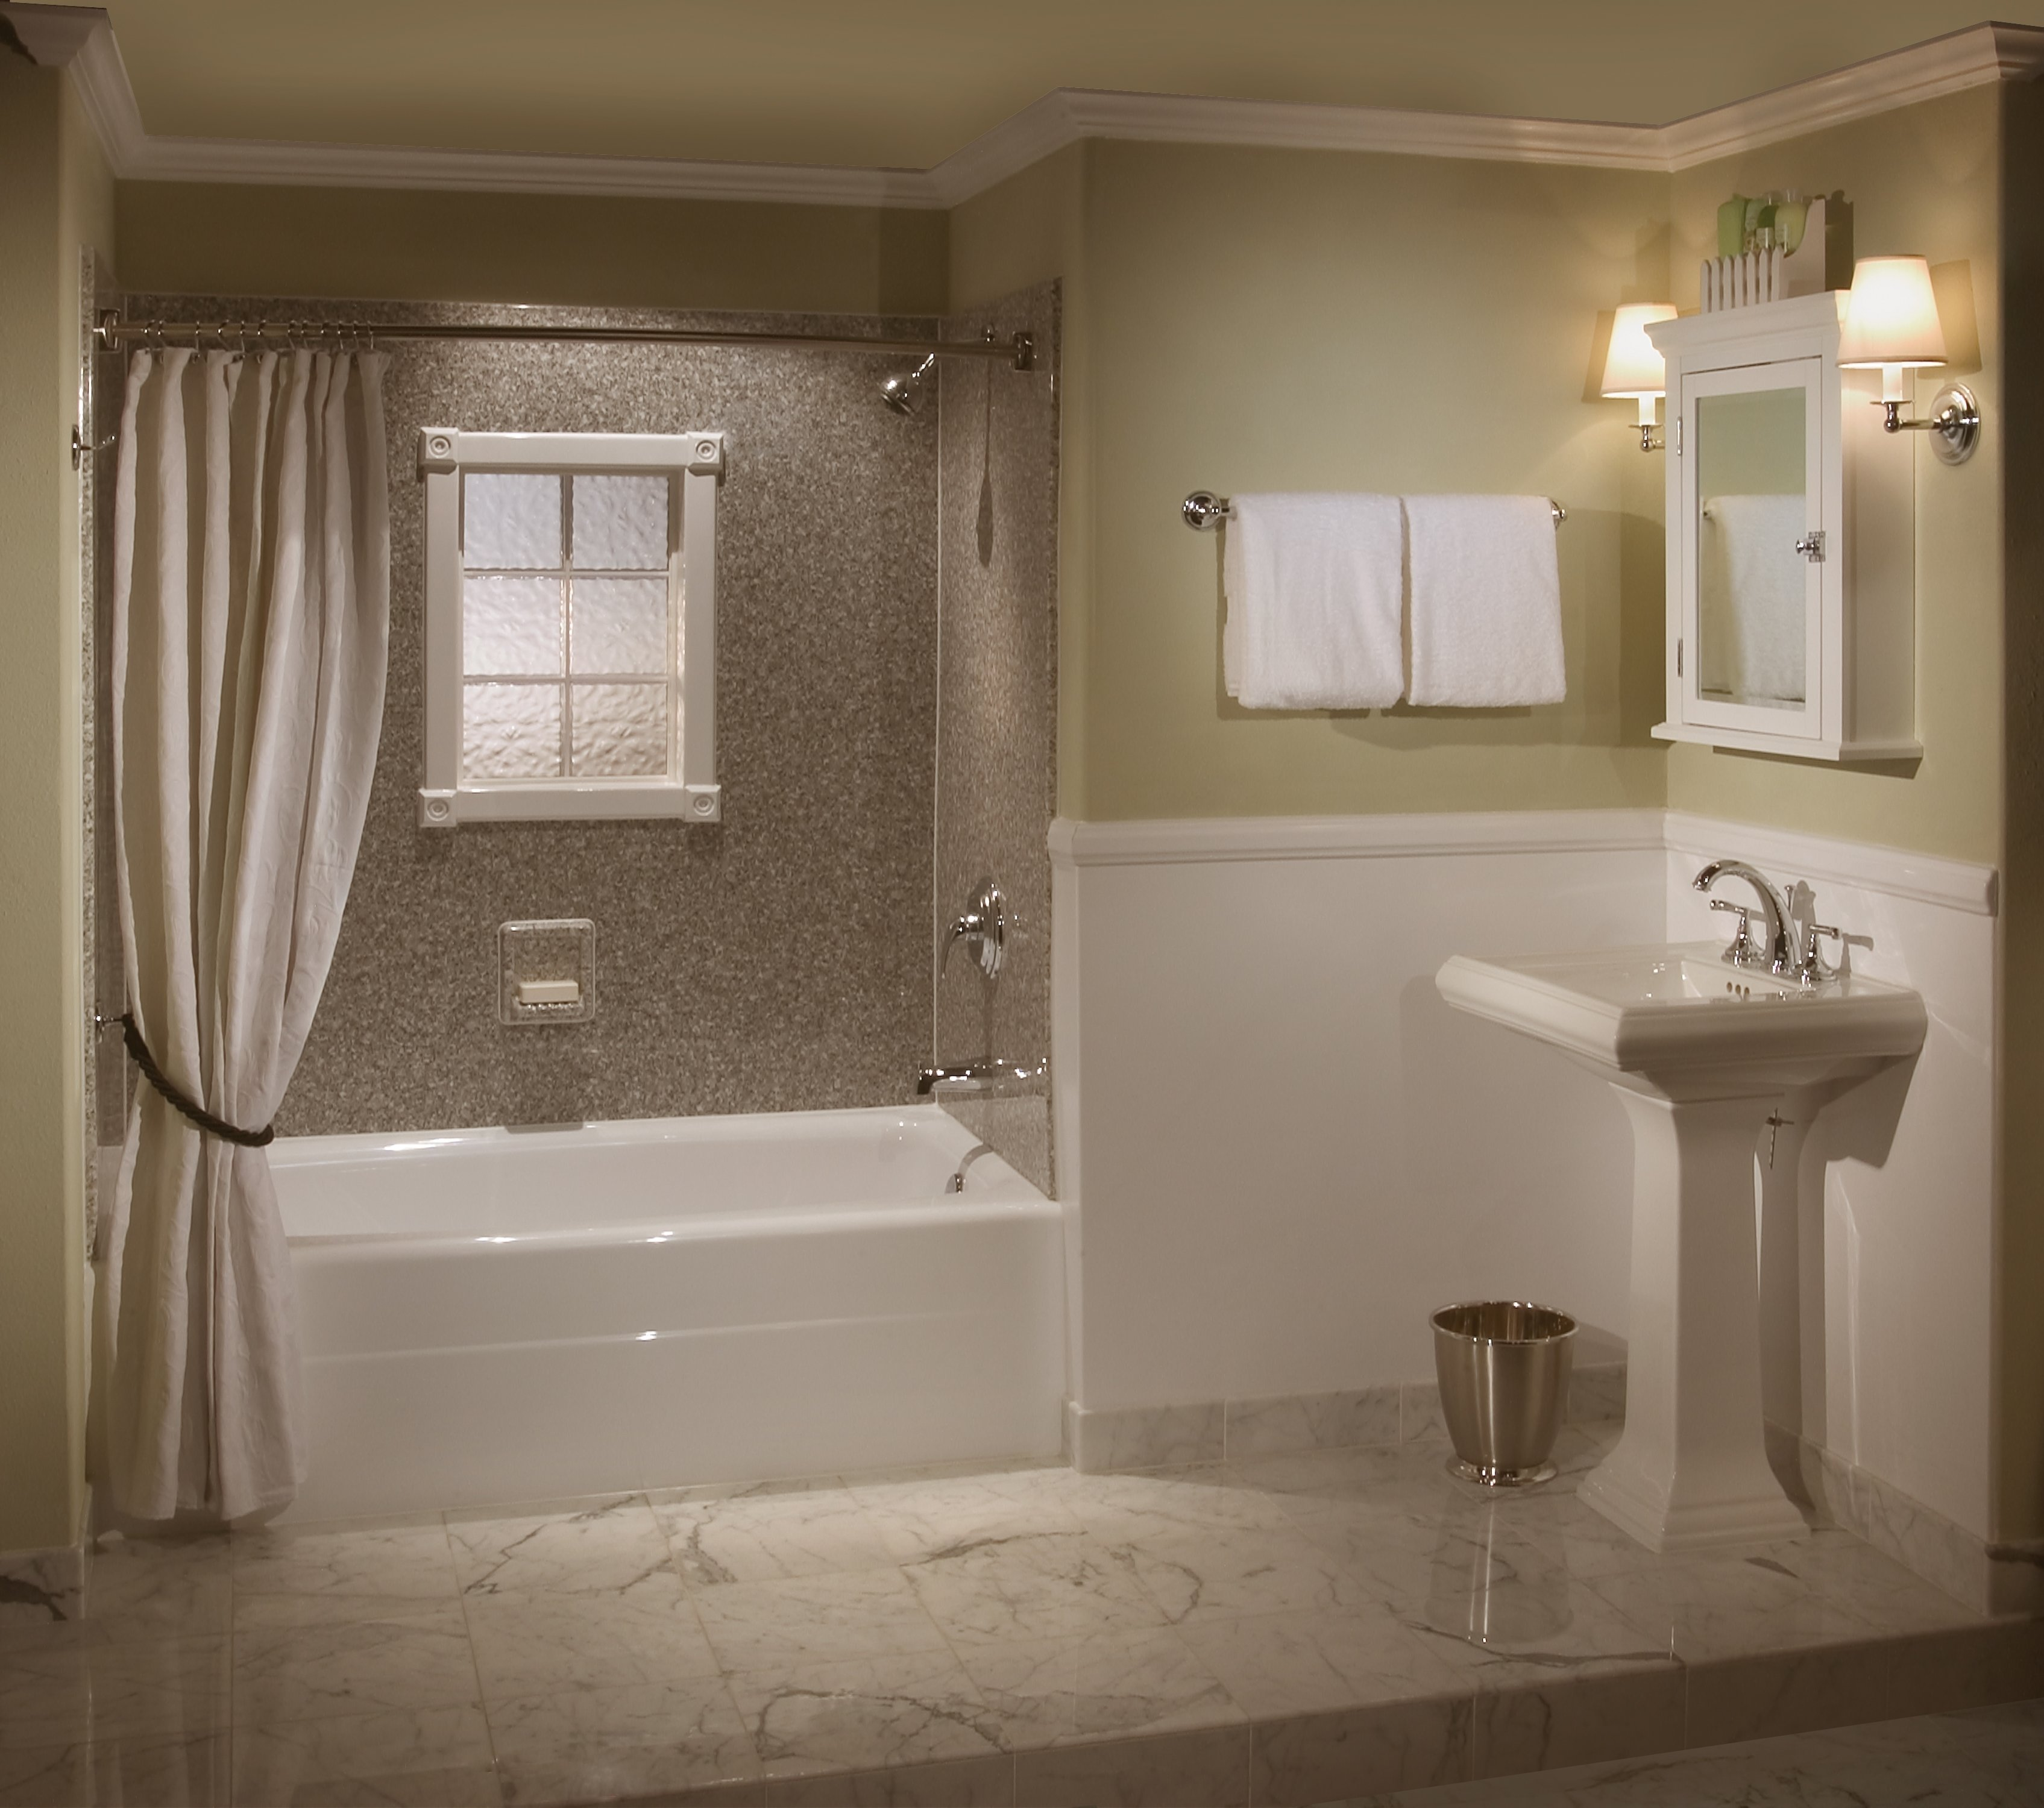 10 Fantastic Ideas For Remodeling A Small Bathroom top 63 splendid small bathroom remodel with tub washroom renovation